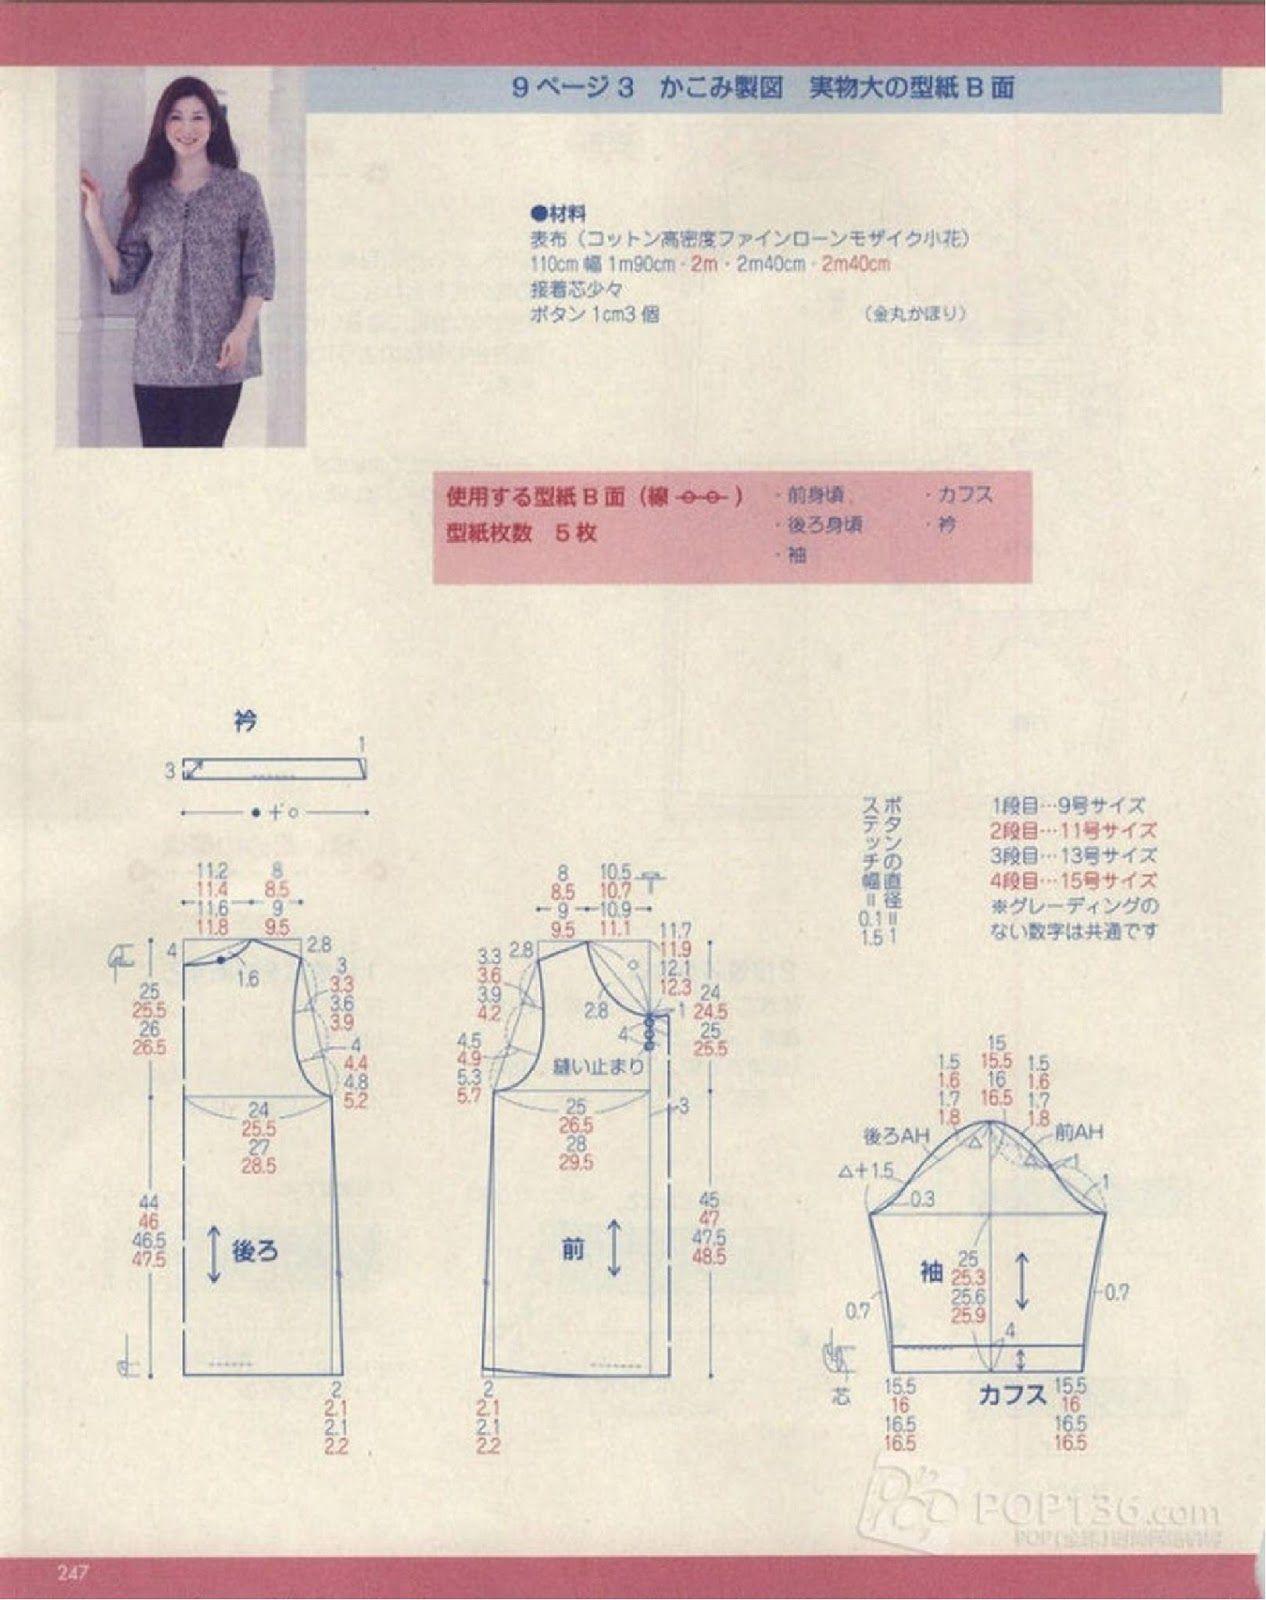 Pin de Norma Romero en reglas p moldes | Pinterest | Costura ...